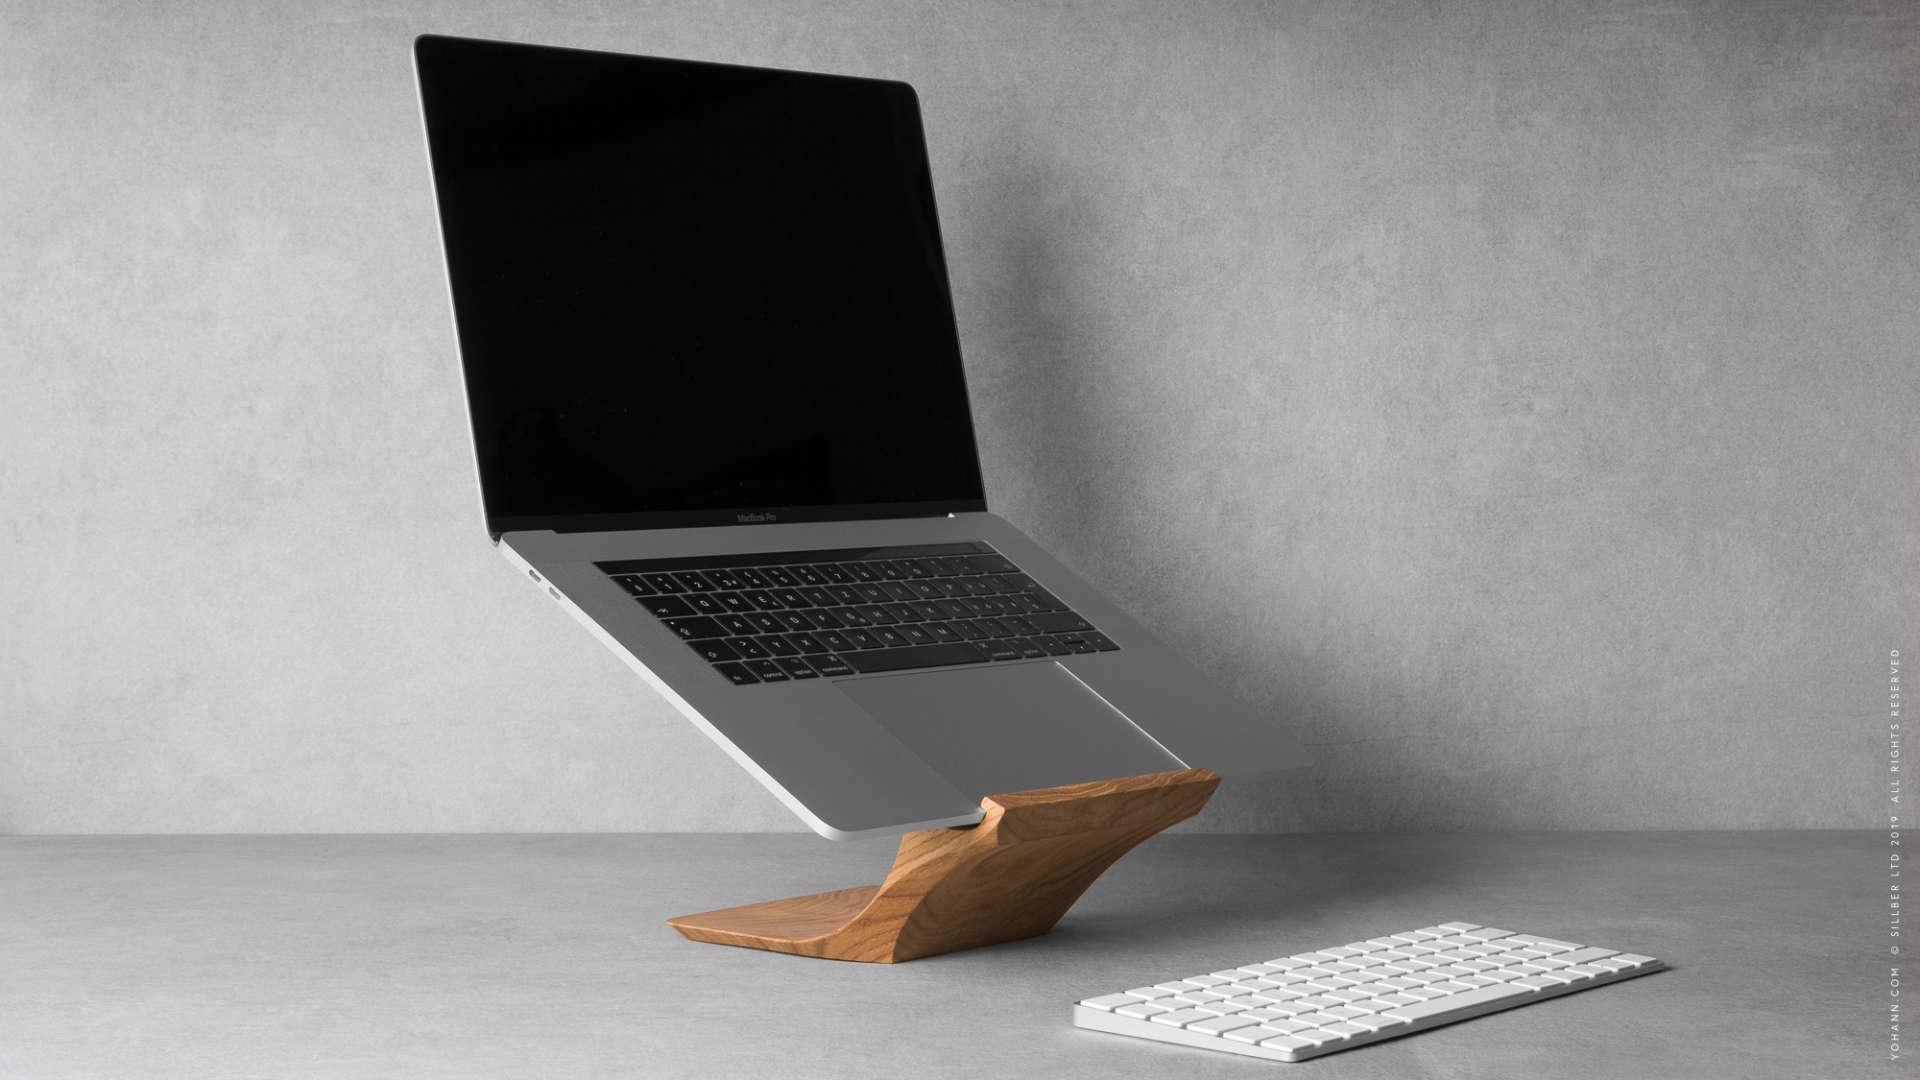 Yohann MacBook Stand Eiche Holz